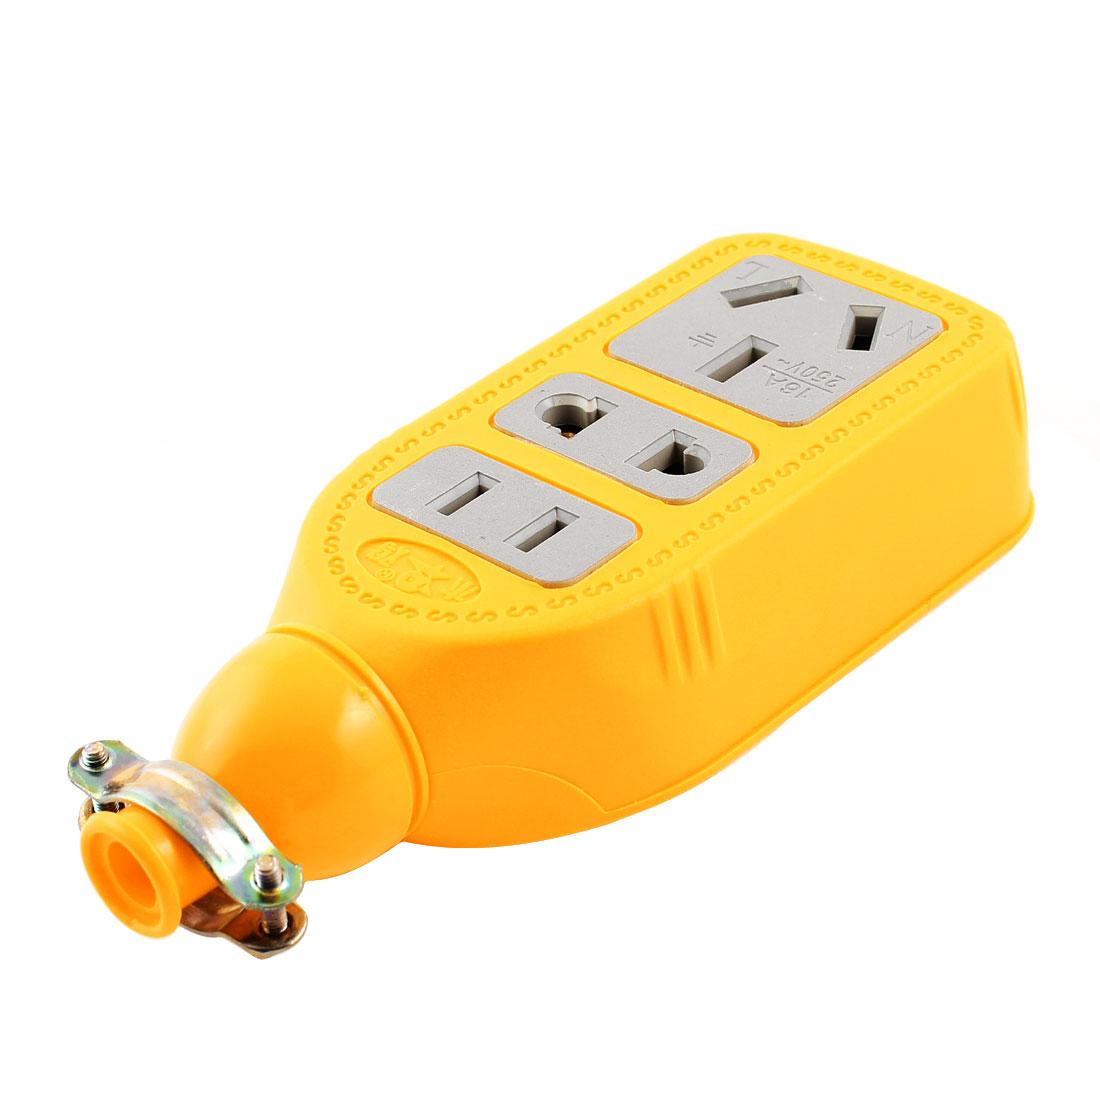 AU EU US Plug AC 250V 16A 3 Outlet Sockets Electric Power Strip Bar Splitter